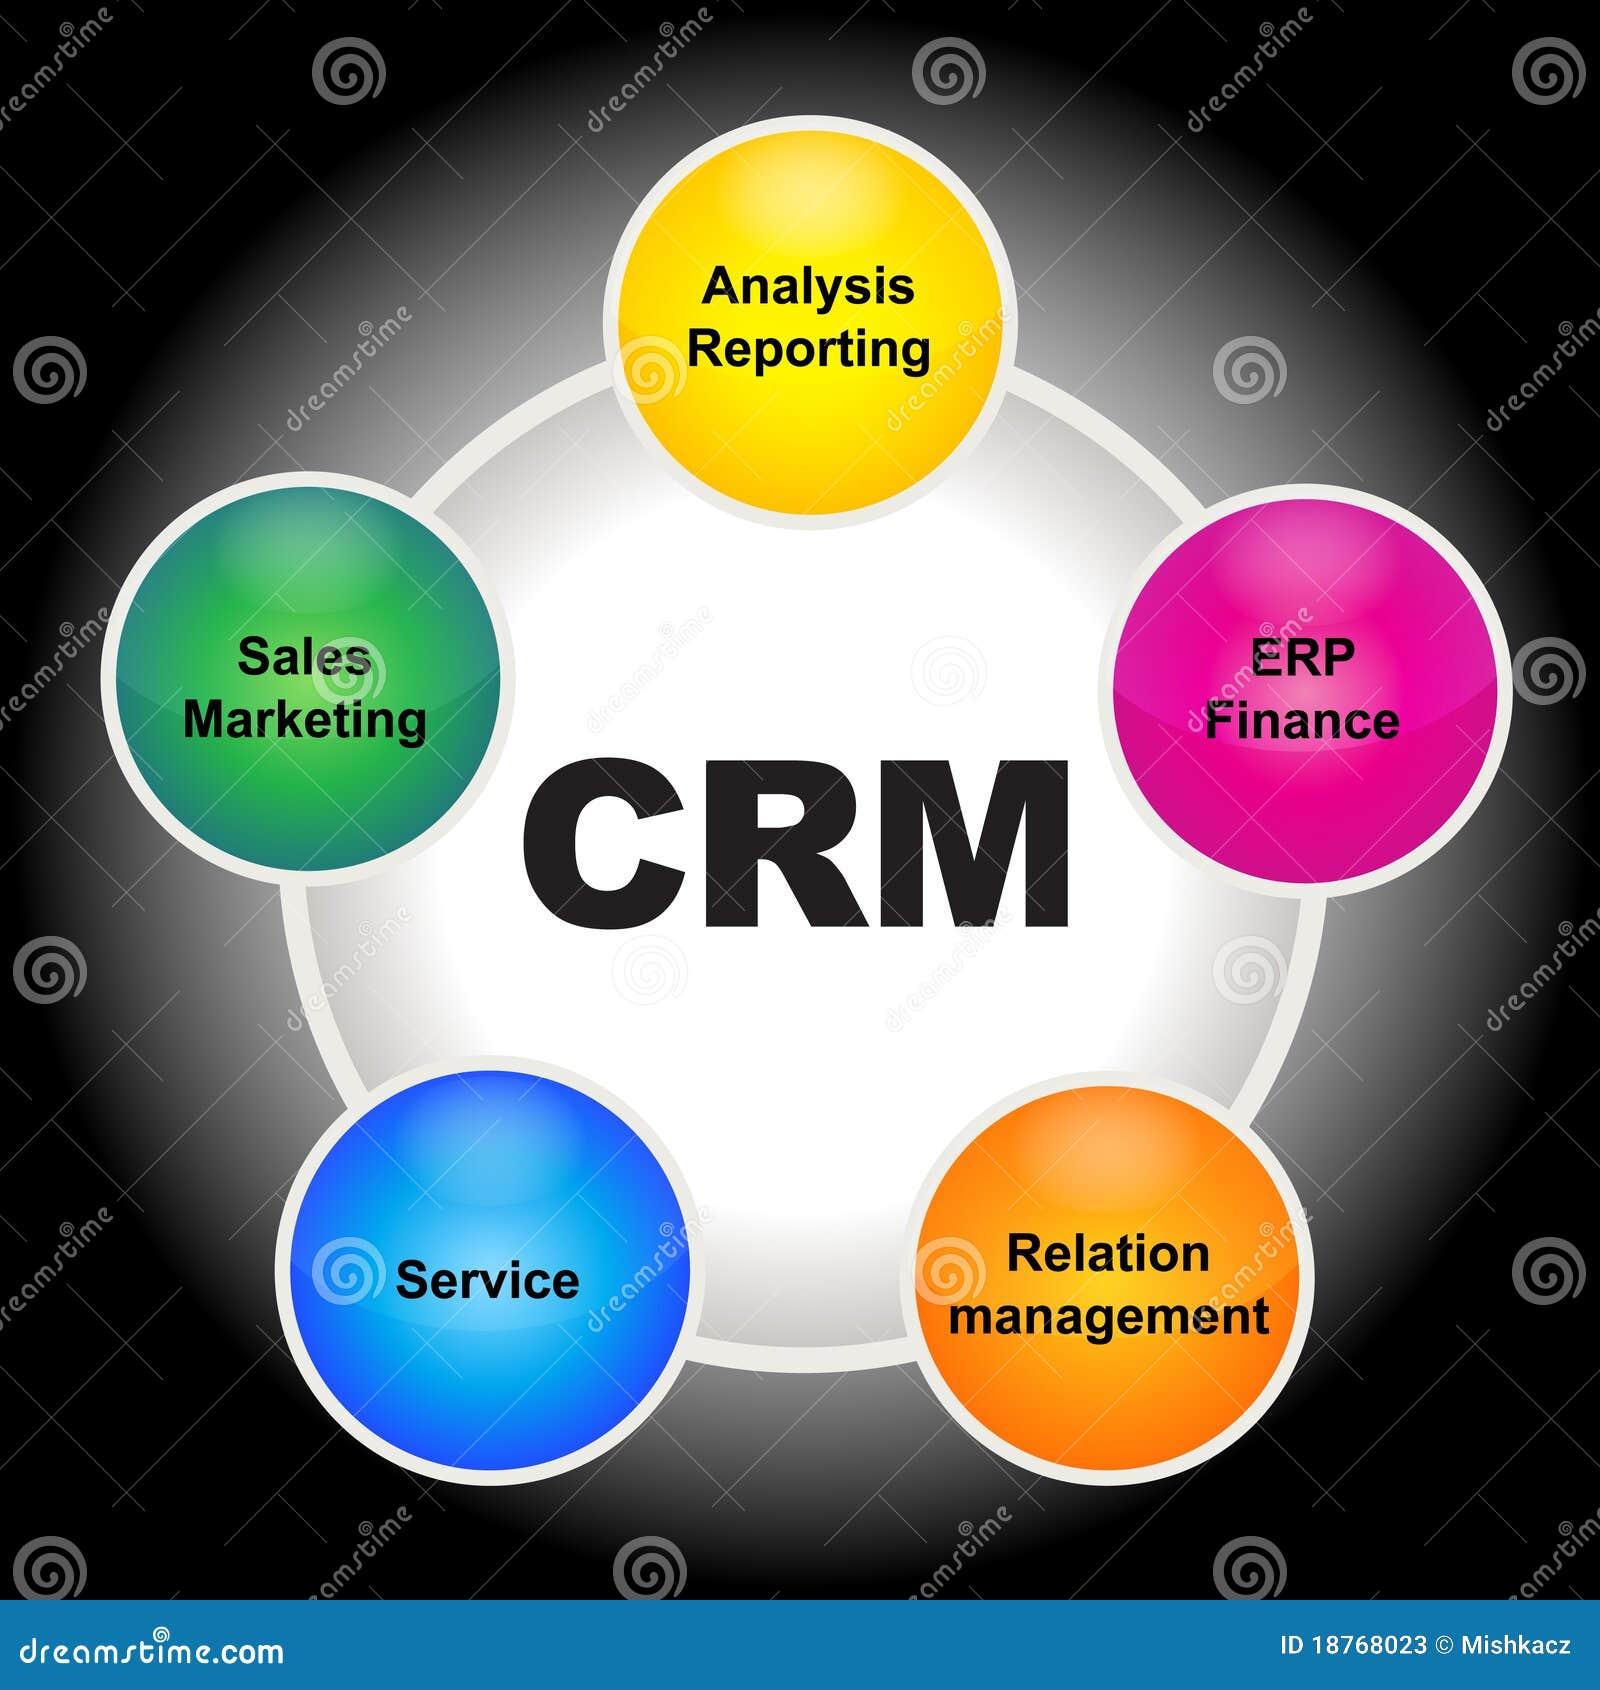 Crm Stock Photos Image 18768023